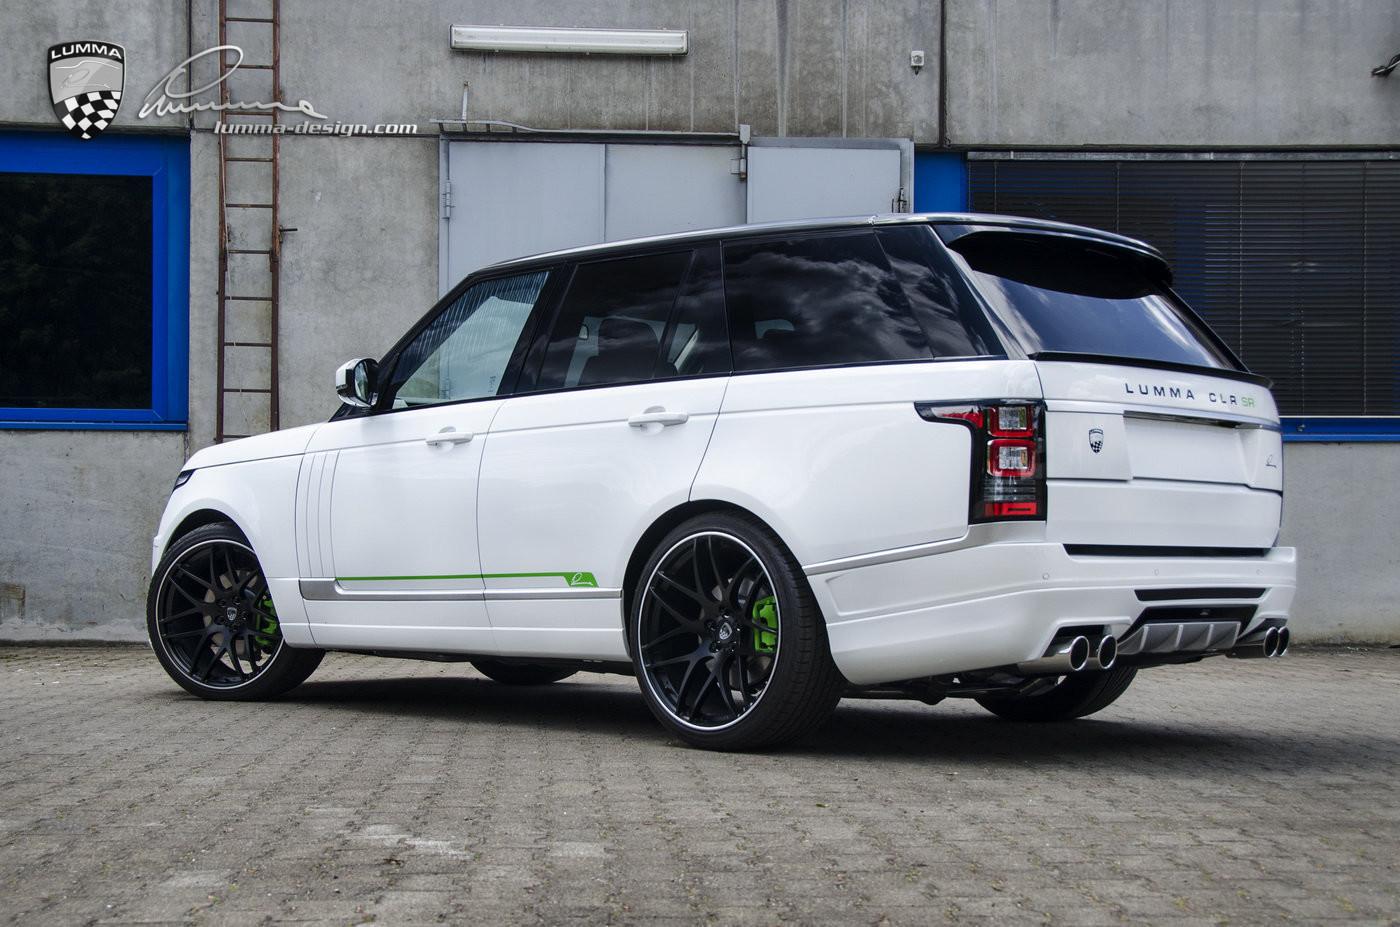 Lumma News Clr Sr Conversion Based On Range Rover Vogue